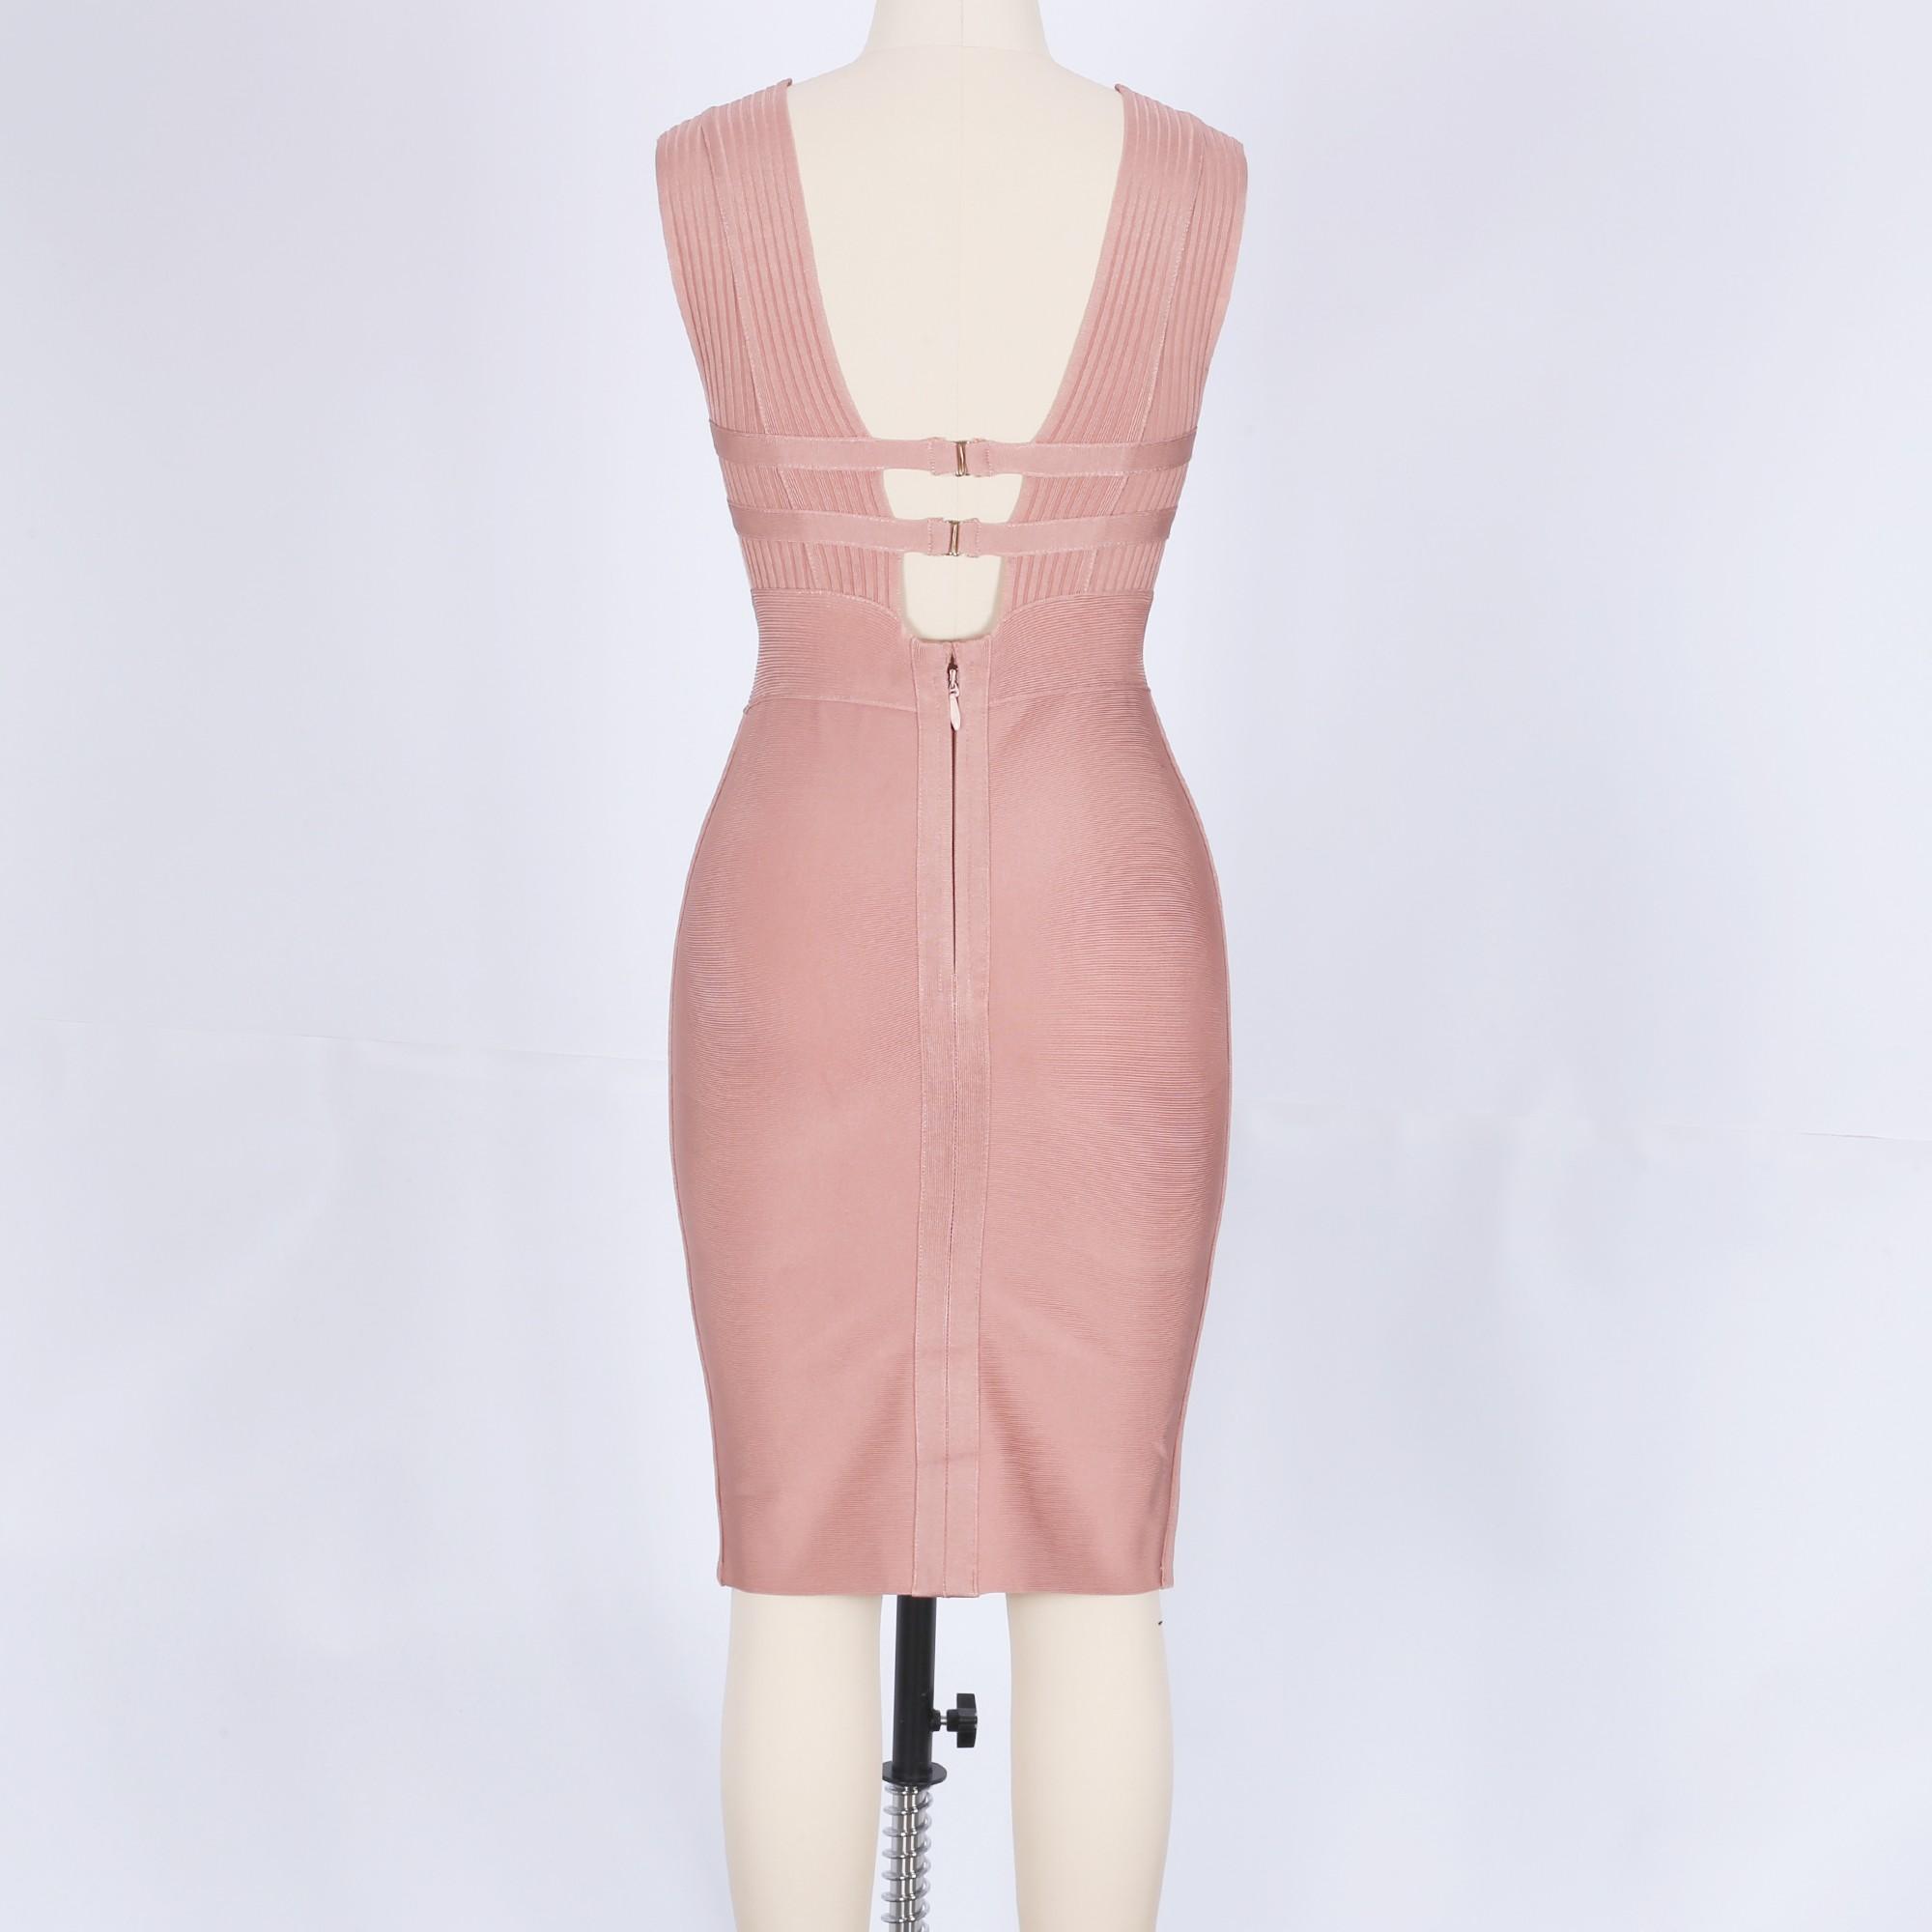 Brown V Neck Sleeveless Mini Plain Sexy Bandage Dress HK048-Brown